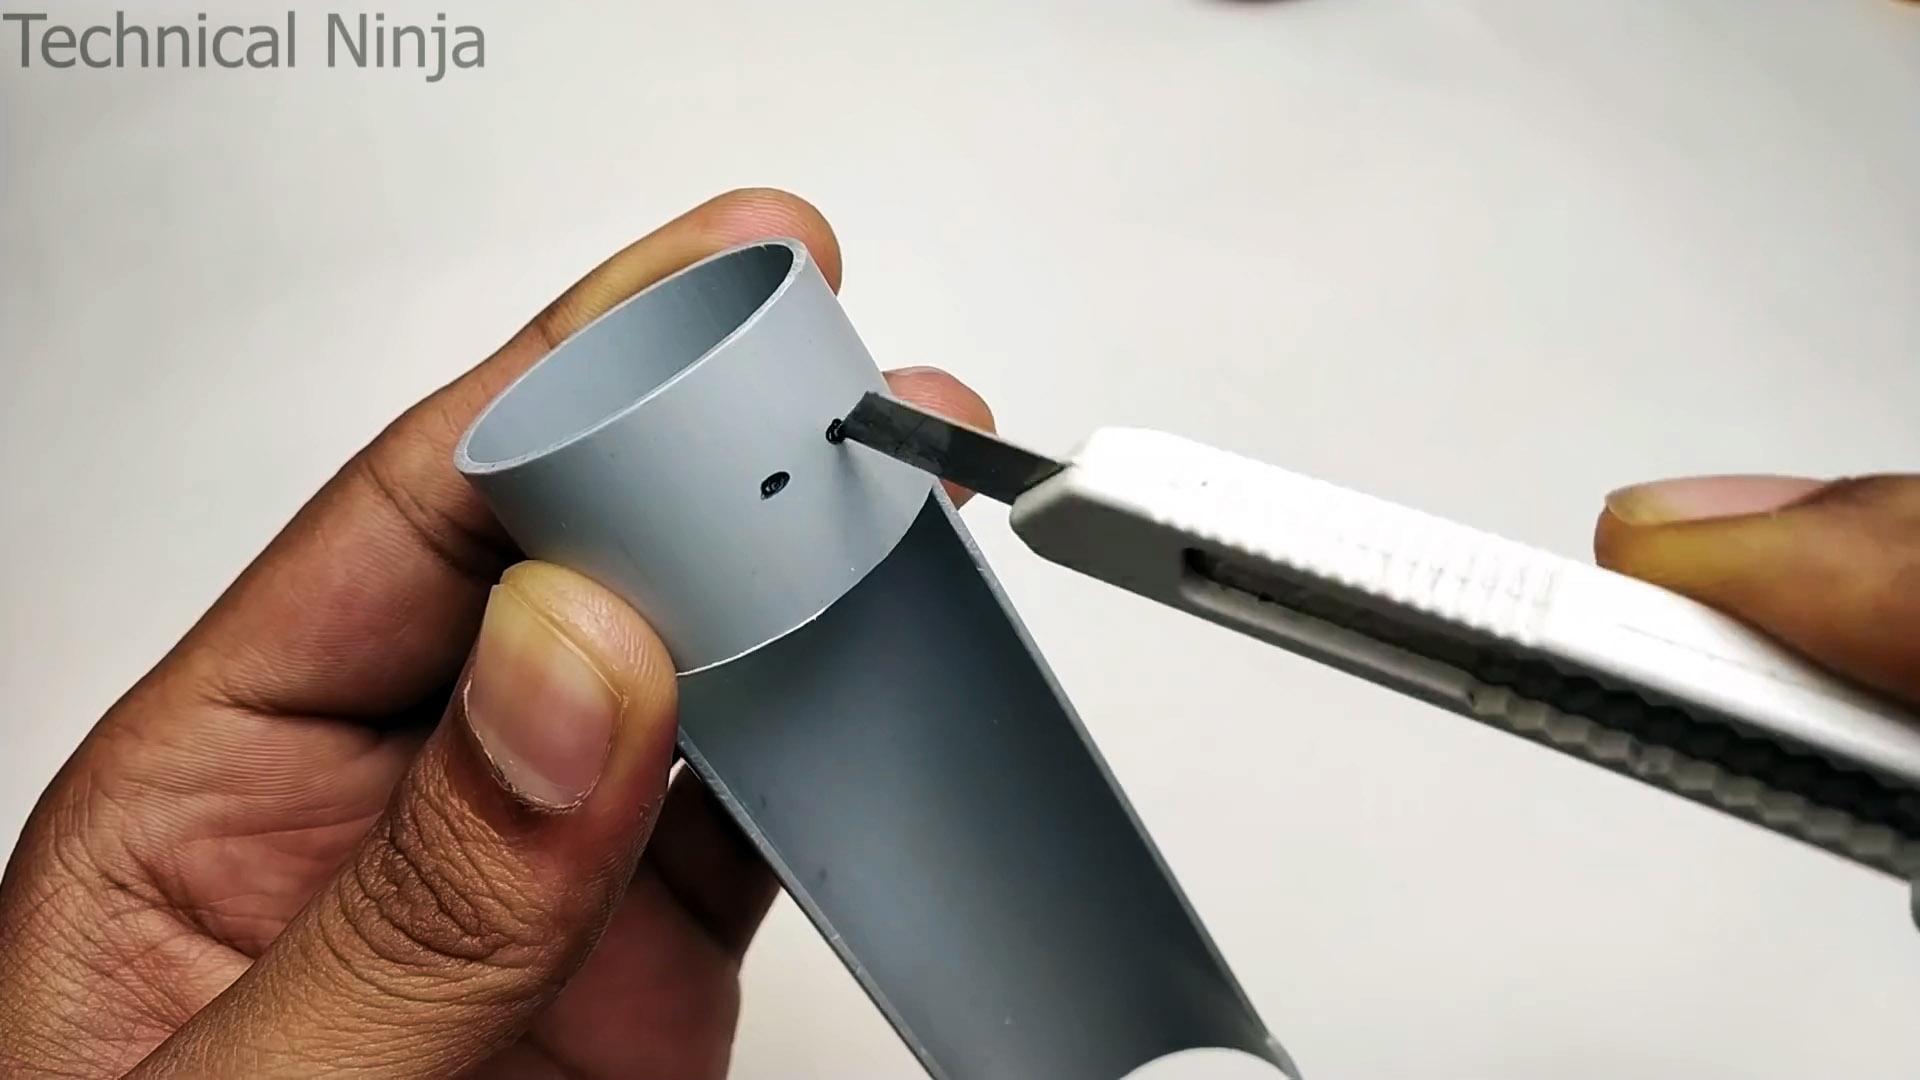 Как сделать USB зарядное устройство для Li-ion 18650 батареи